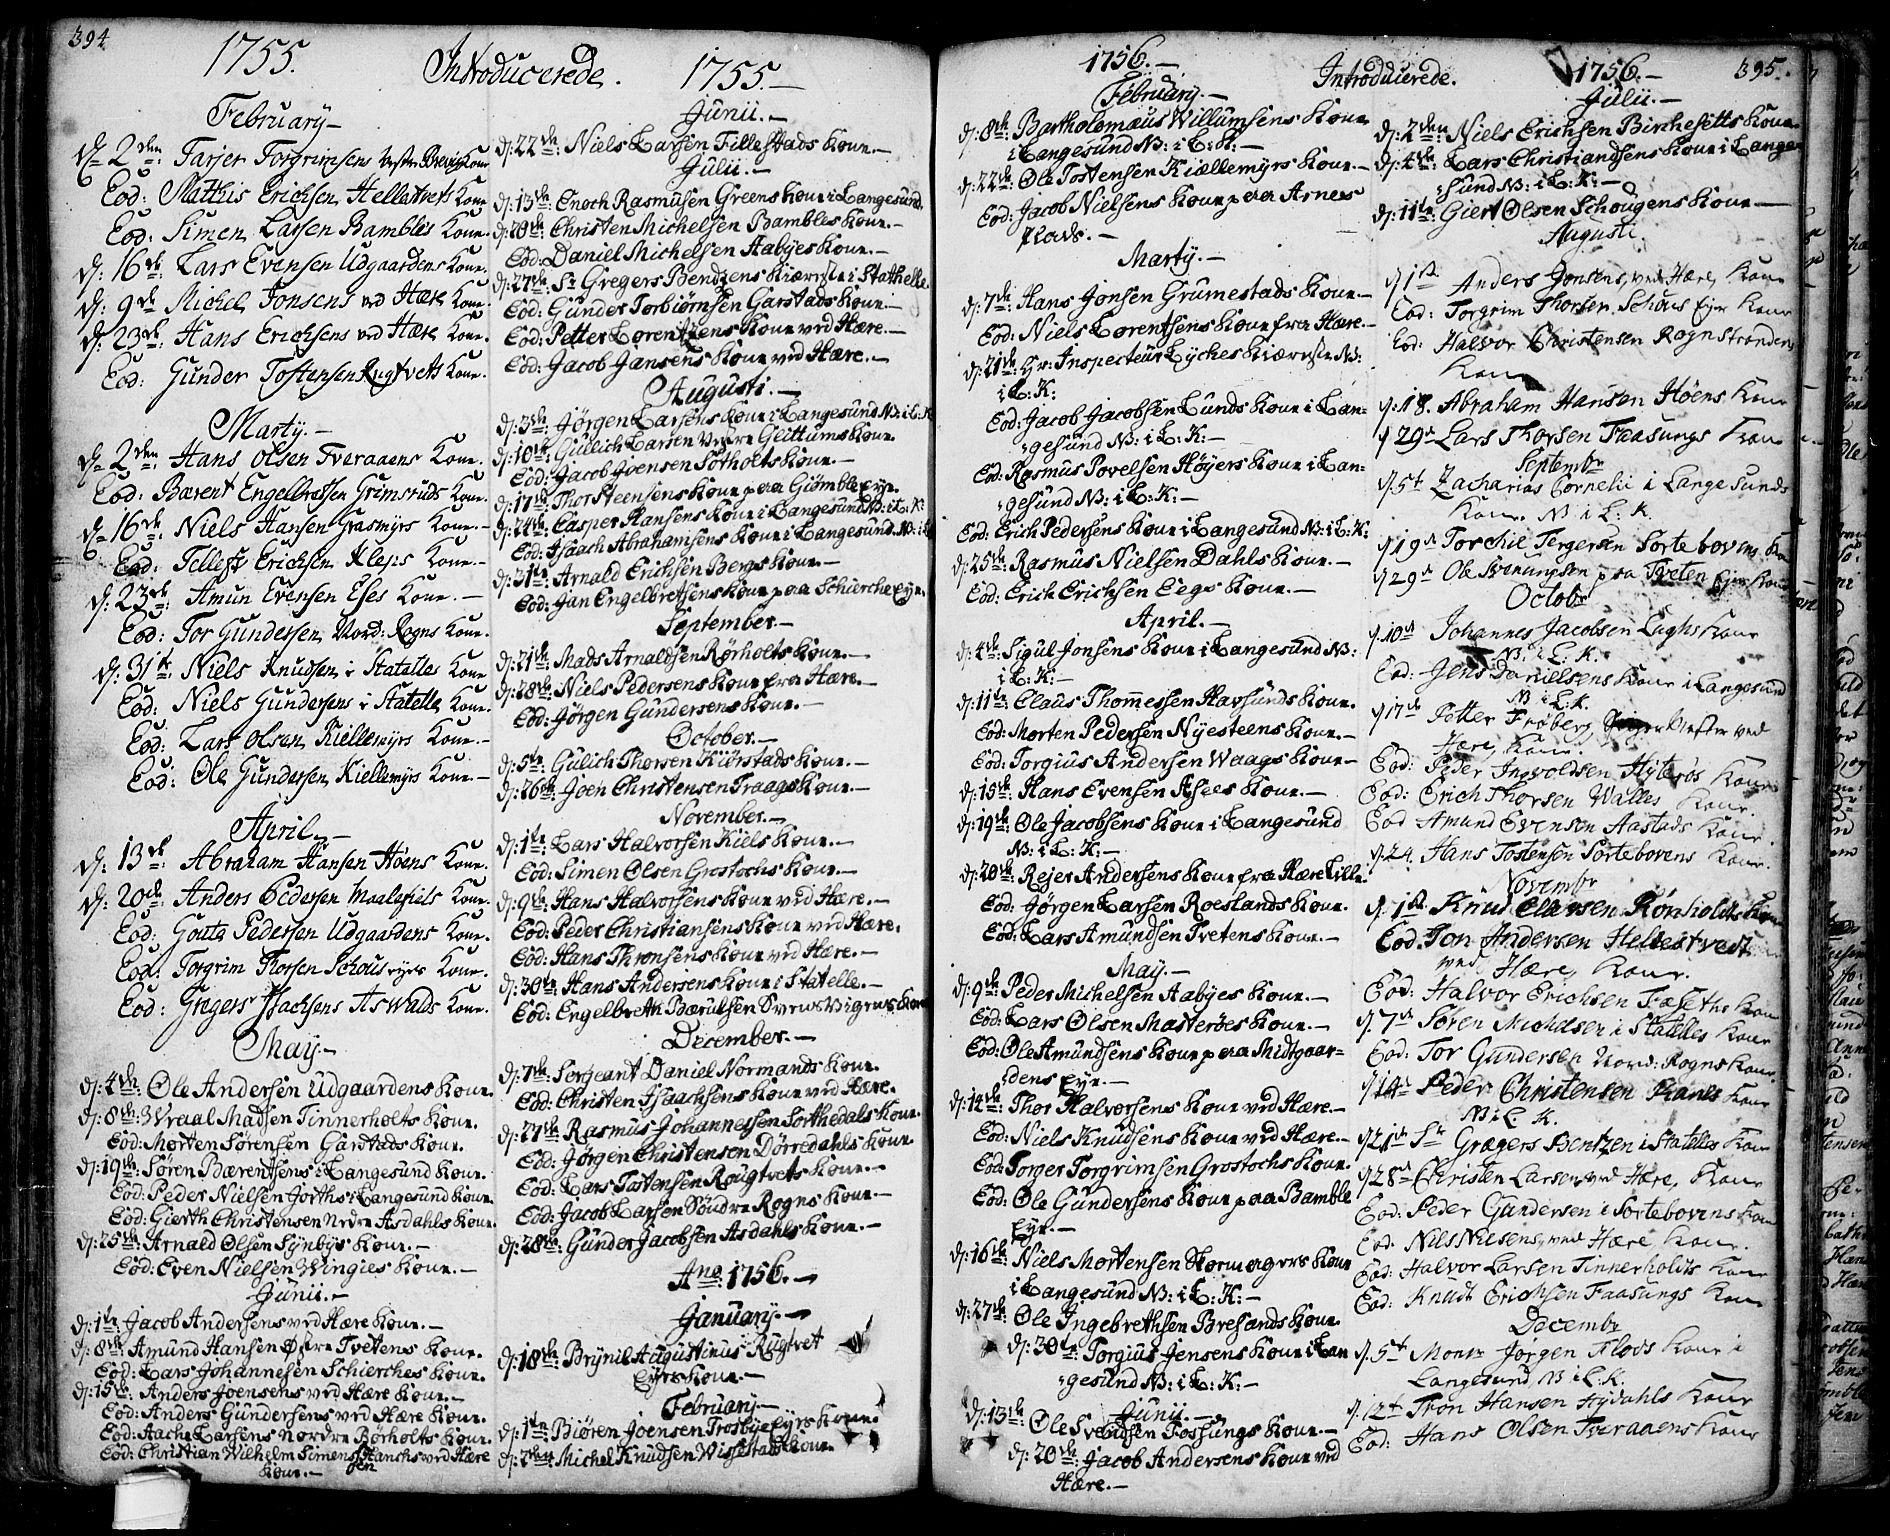 SAKO, Bamble kirkebøker, F/Fa/L0001: Ministerialbok nr. I 1, 1702-1774, s. 394-395